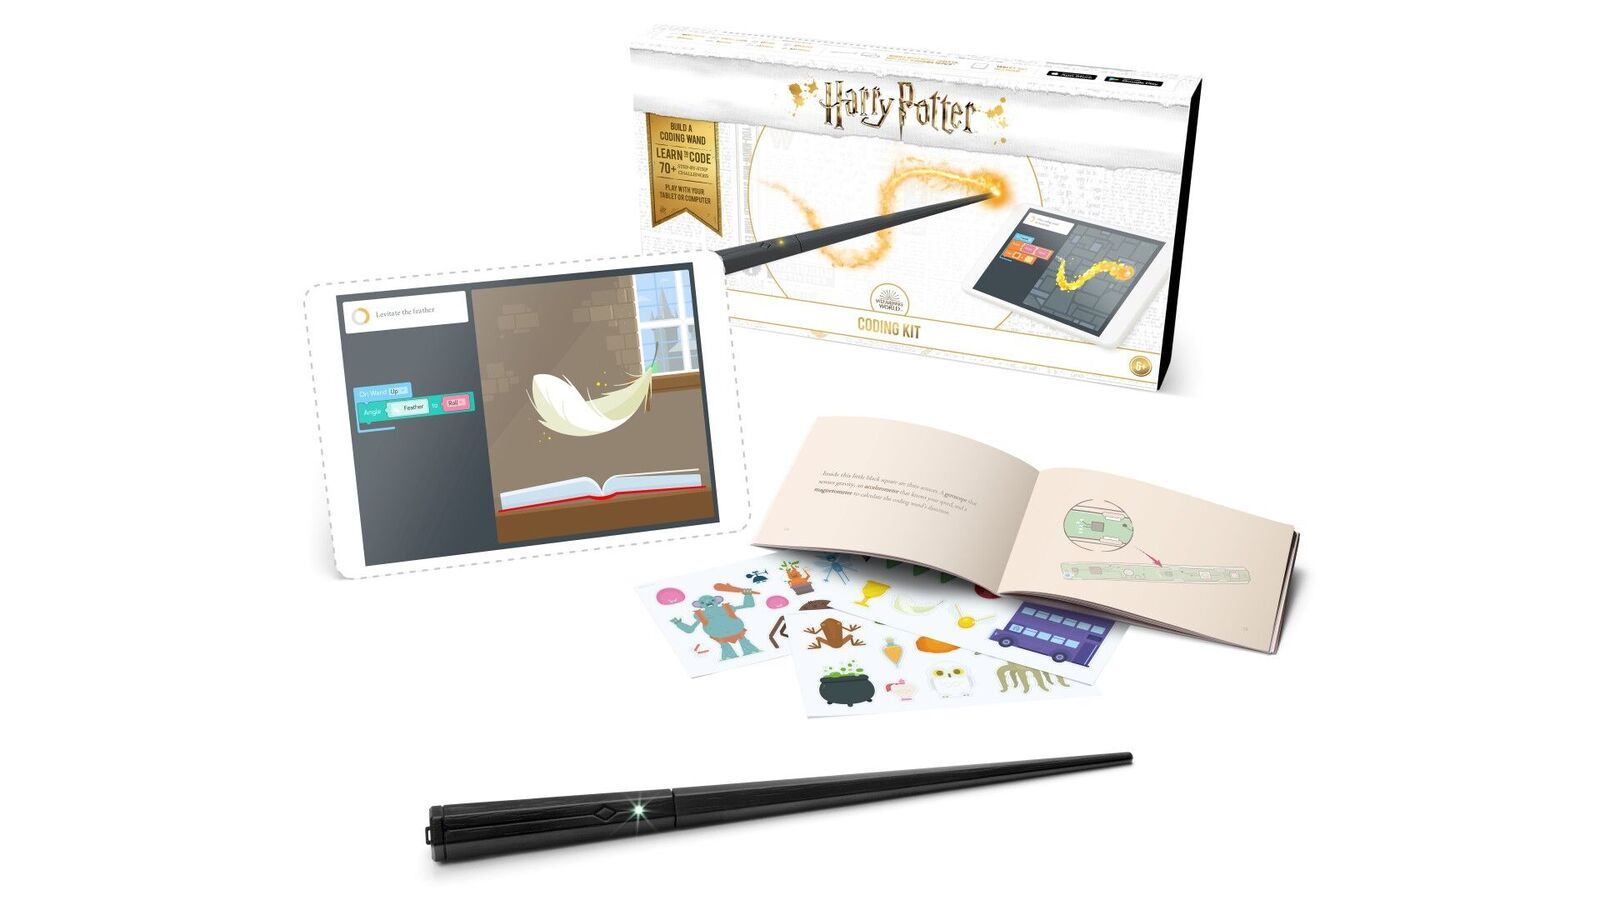 Harry Potter coding wand